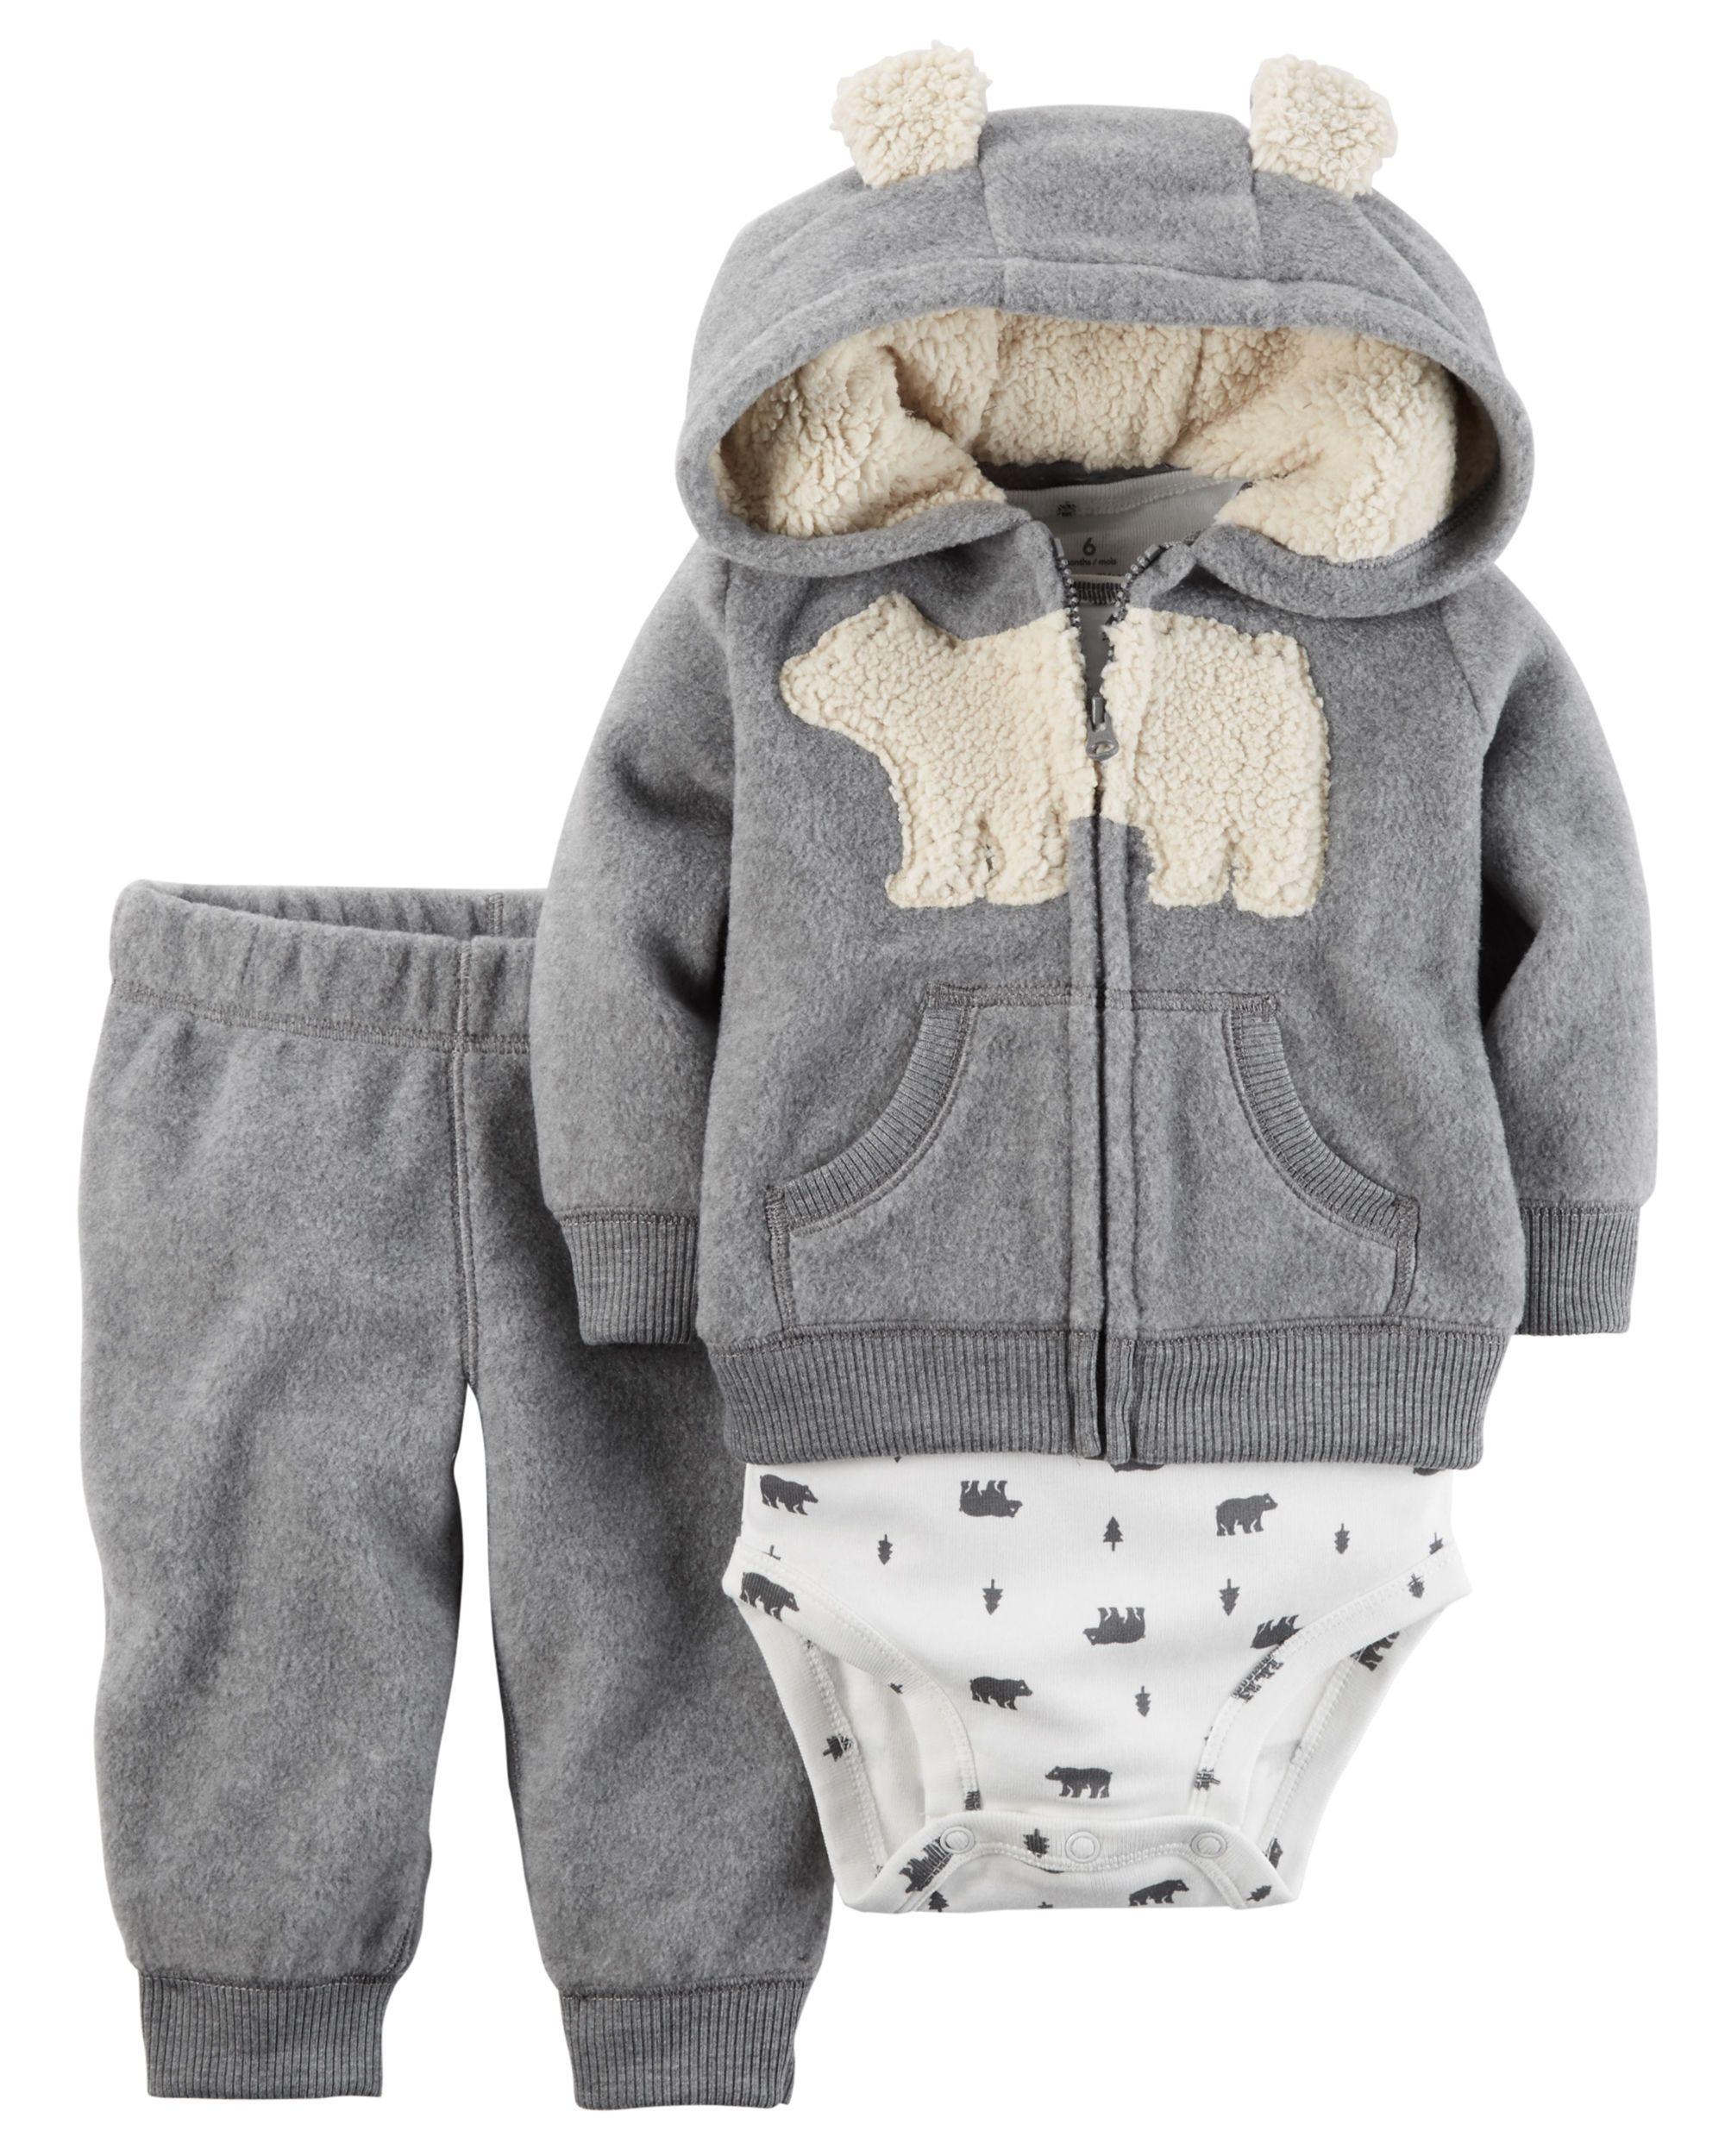 a310f63b7 Baby Boy 3-Piece Little Jacket Set